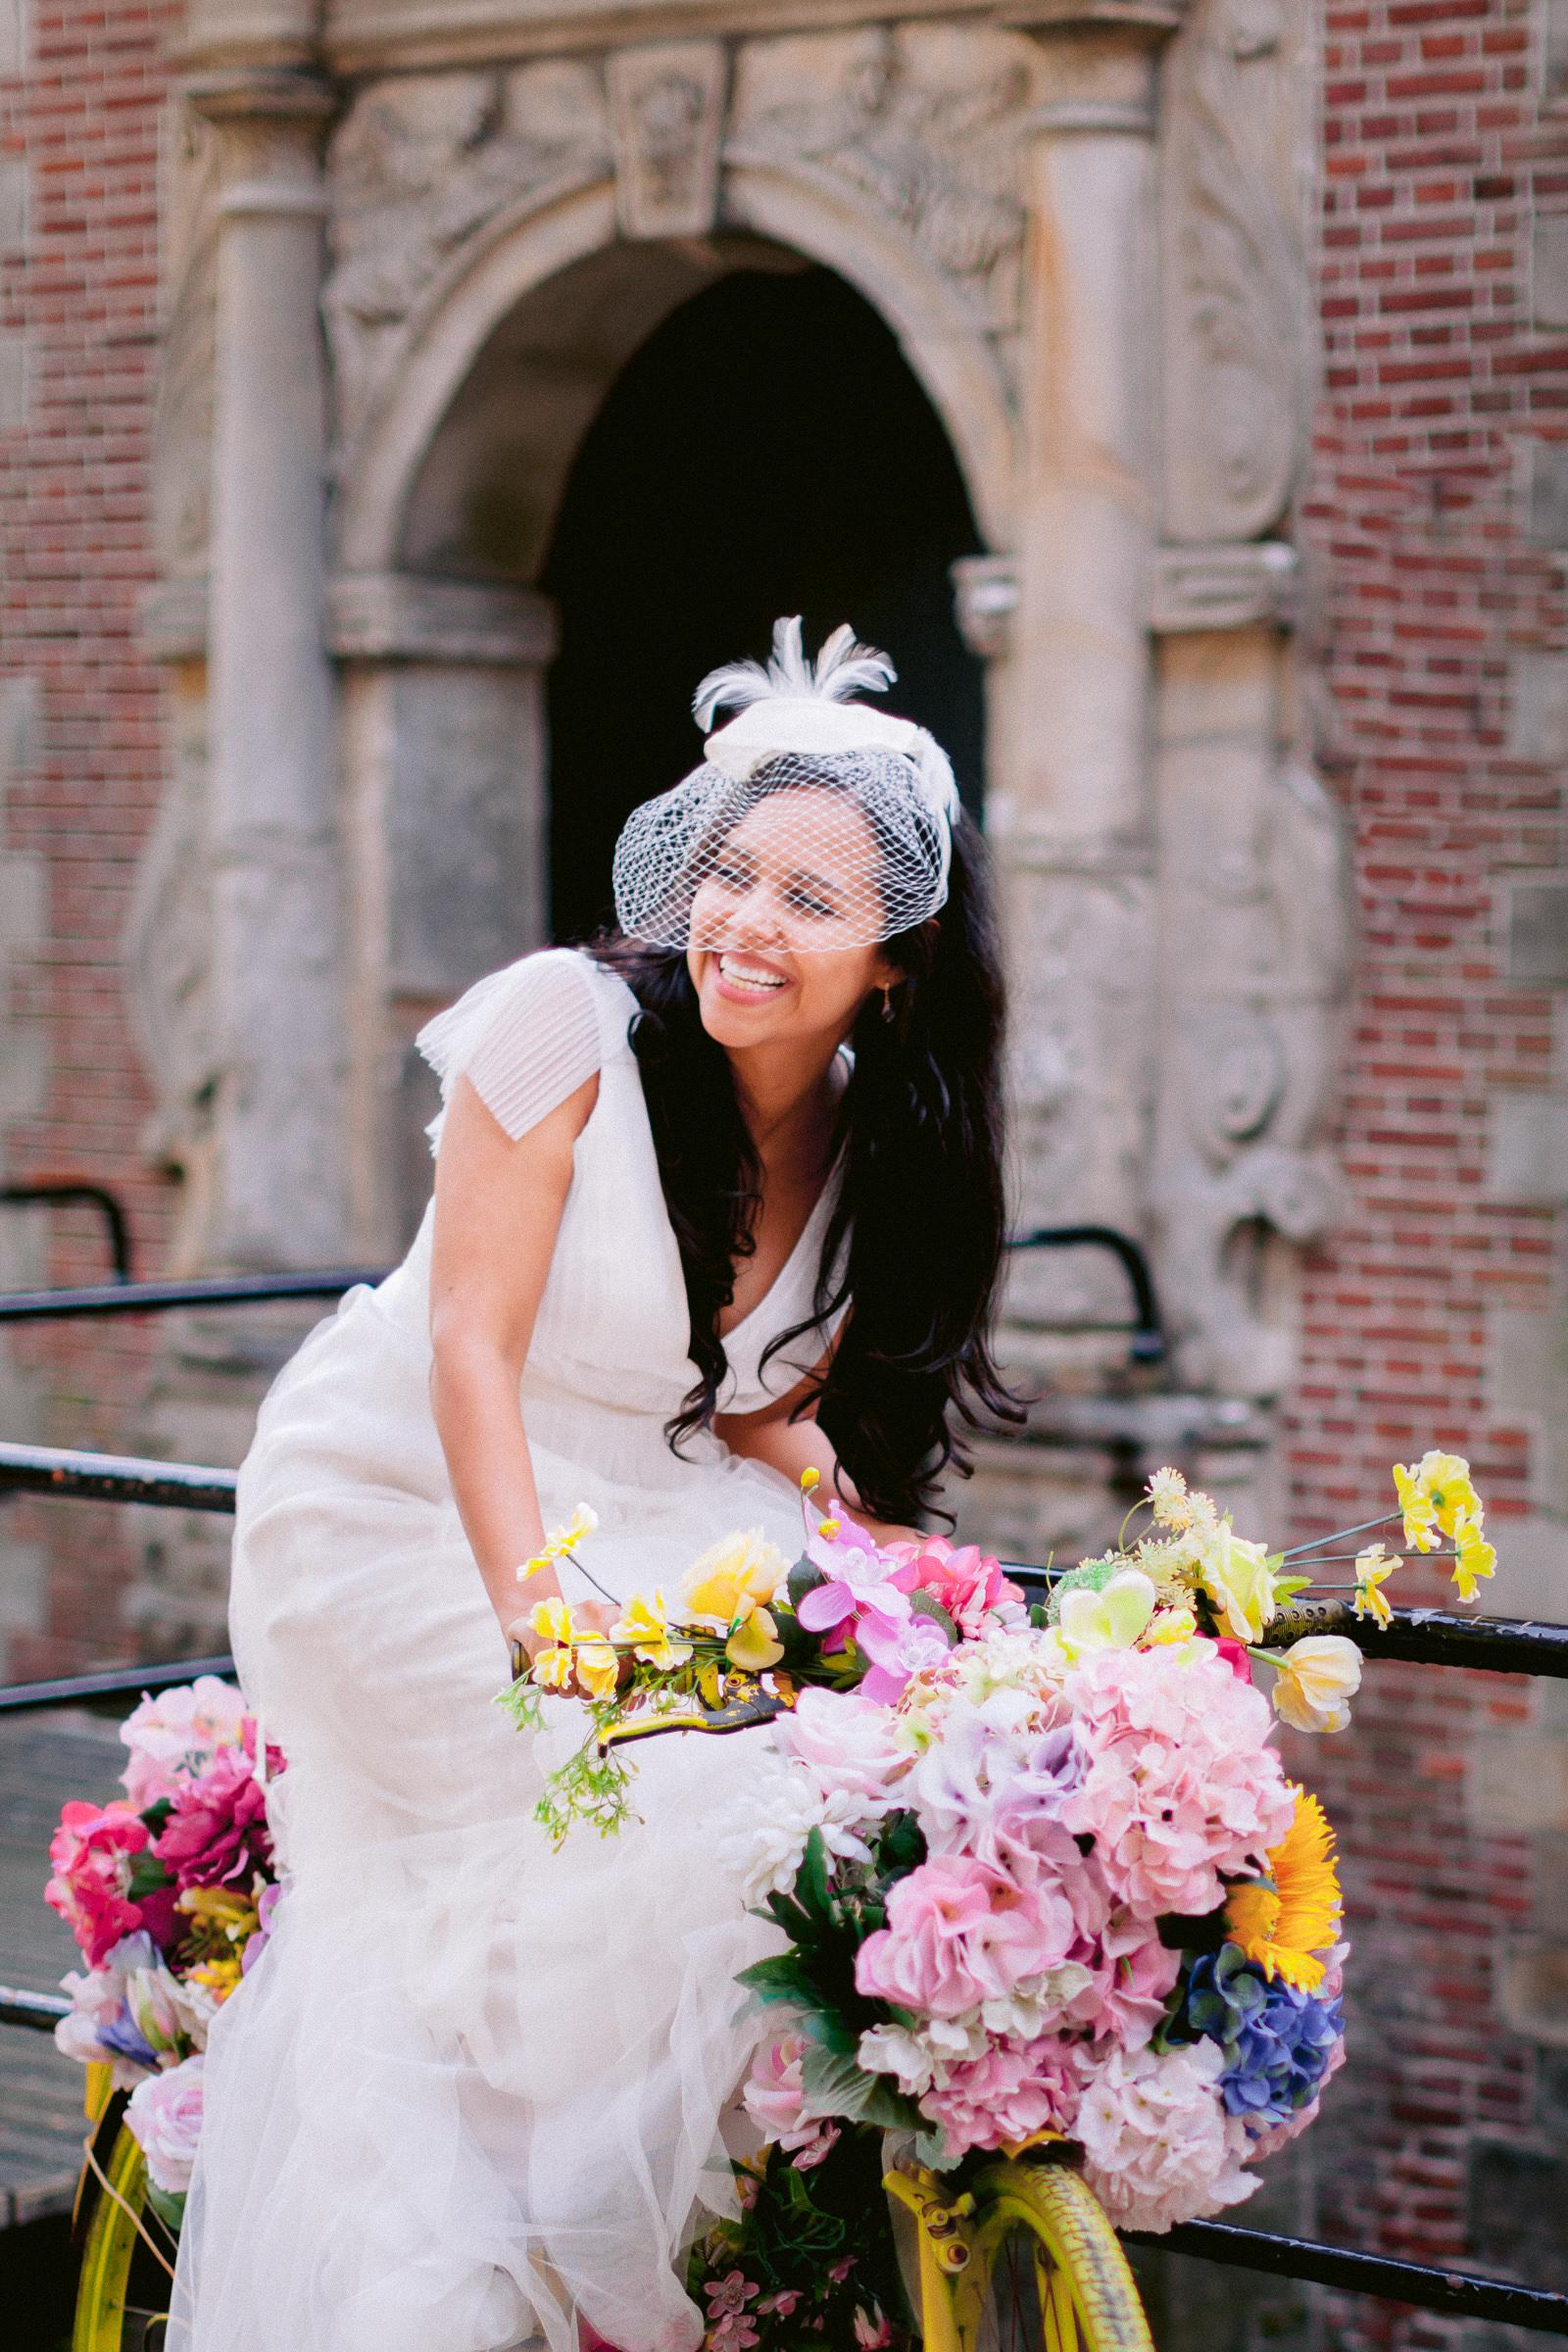 Bride on pink bicycle wearing birdcage veil - photo by Peter van der Lingen - Netherlands